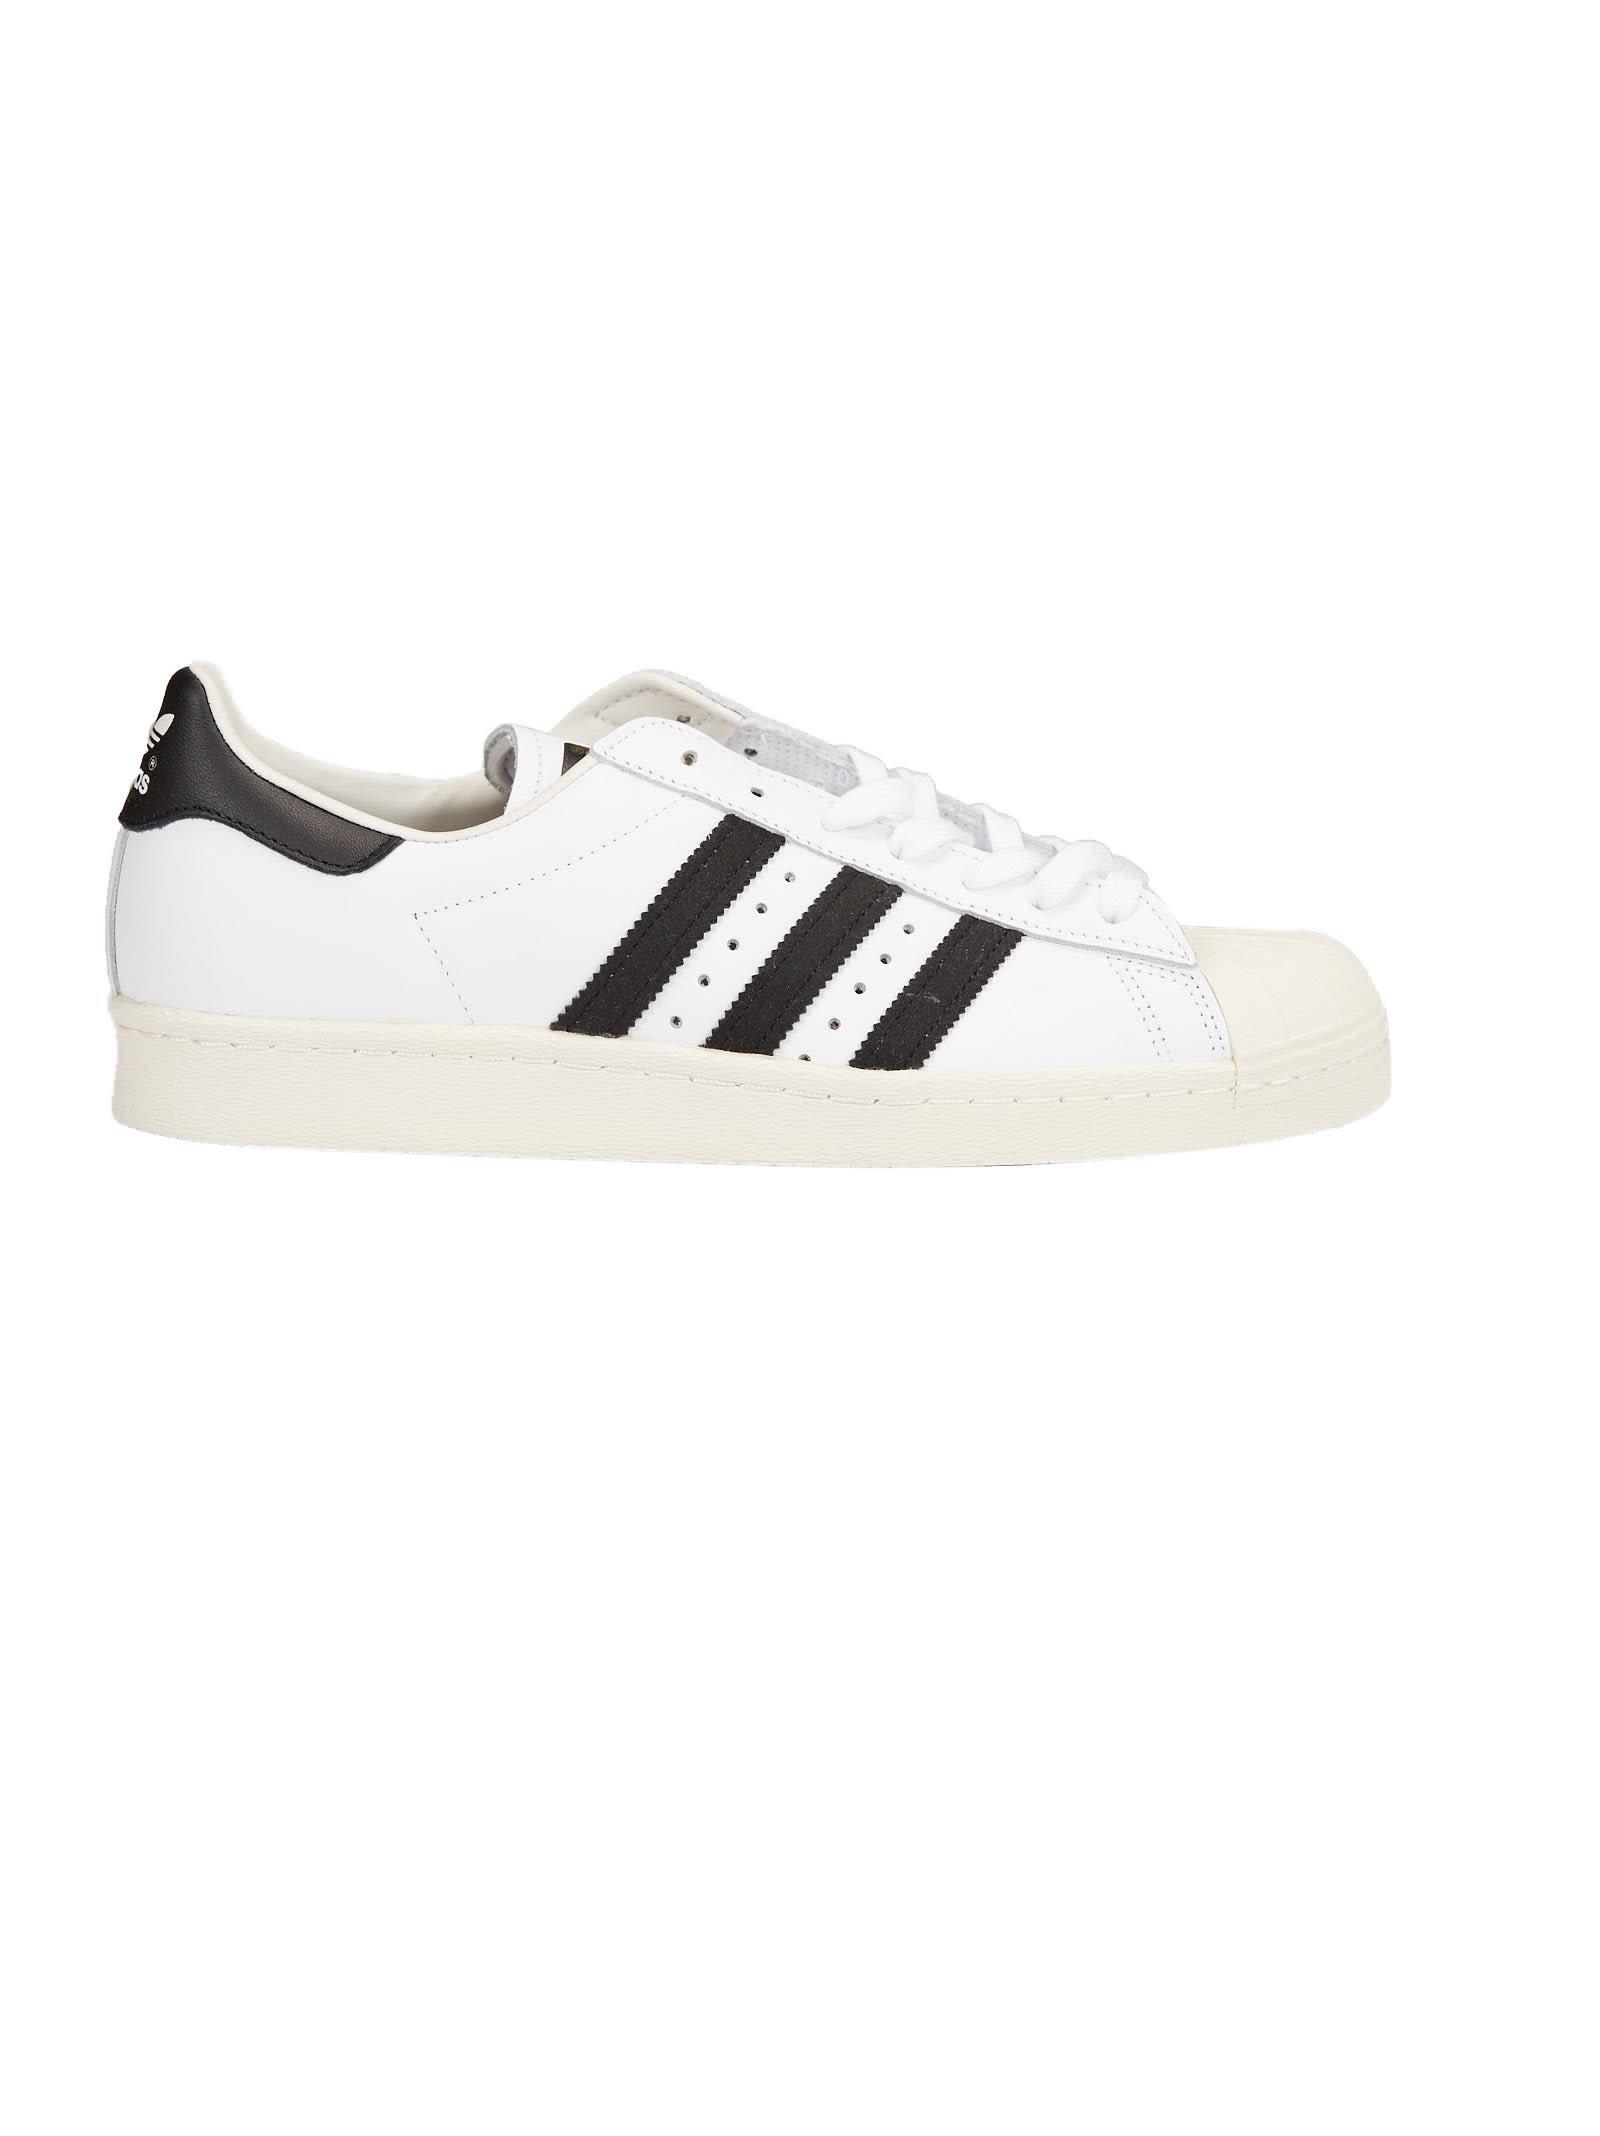 a70a00c61fe SALE. Adidas Originals Adidas Originals Superstar 80s Sneakers (Overige  kleuren)